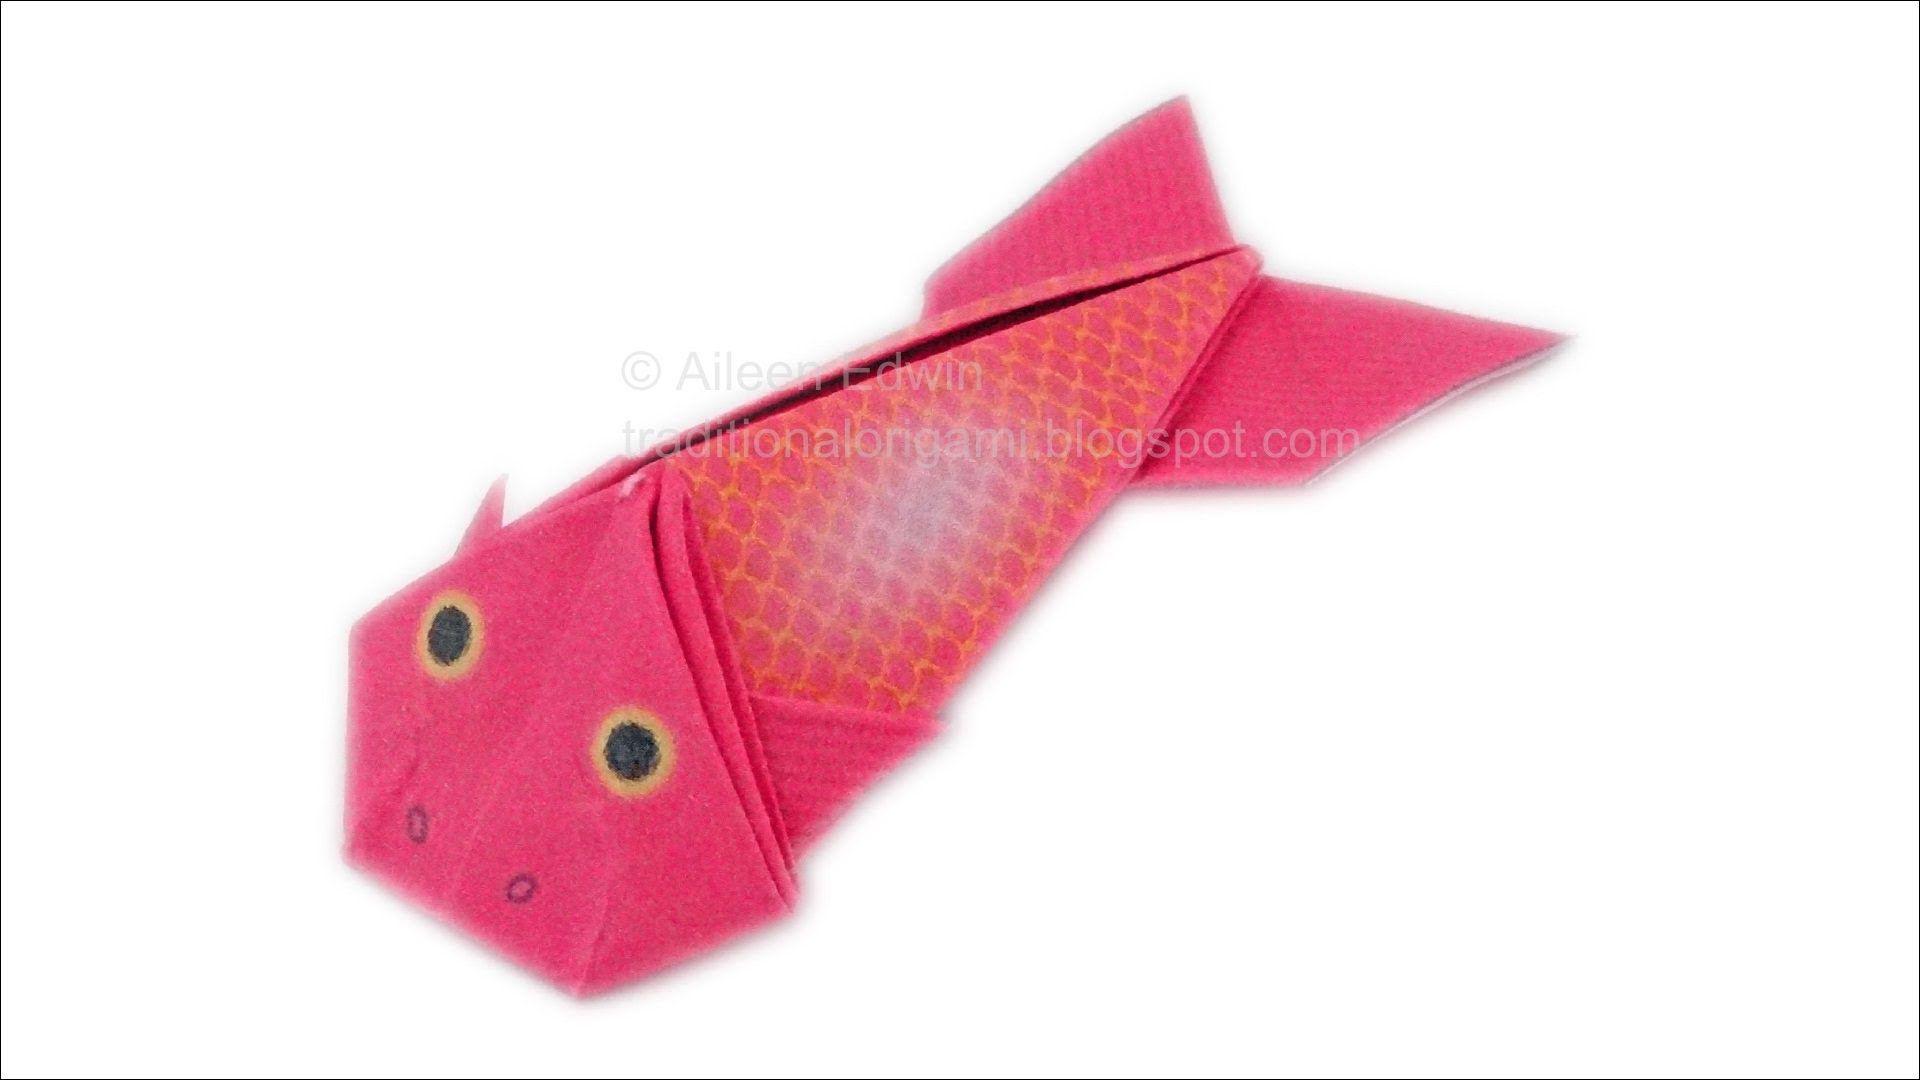 Origami Fish (Aileen Edwin) Video Tutorial *HD*